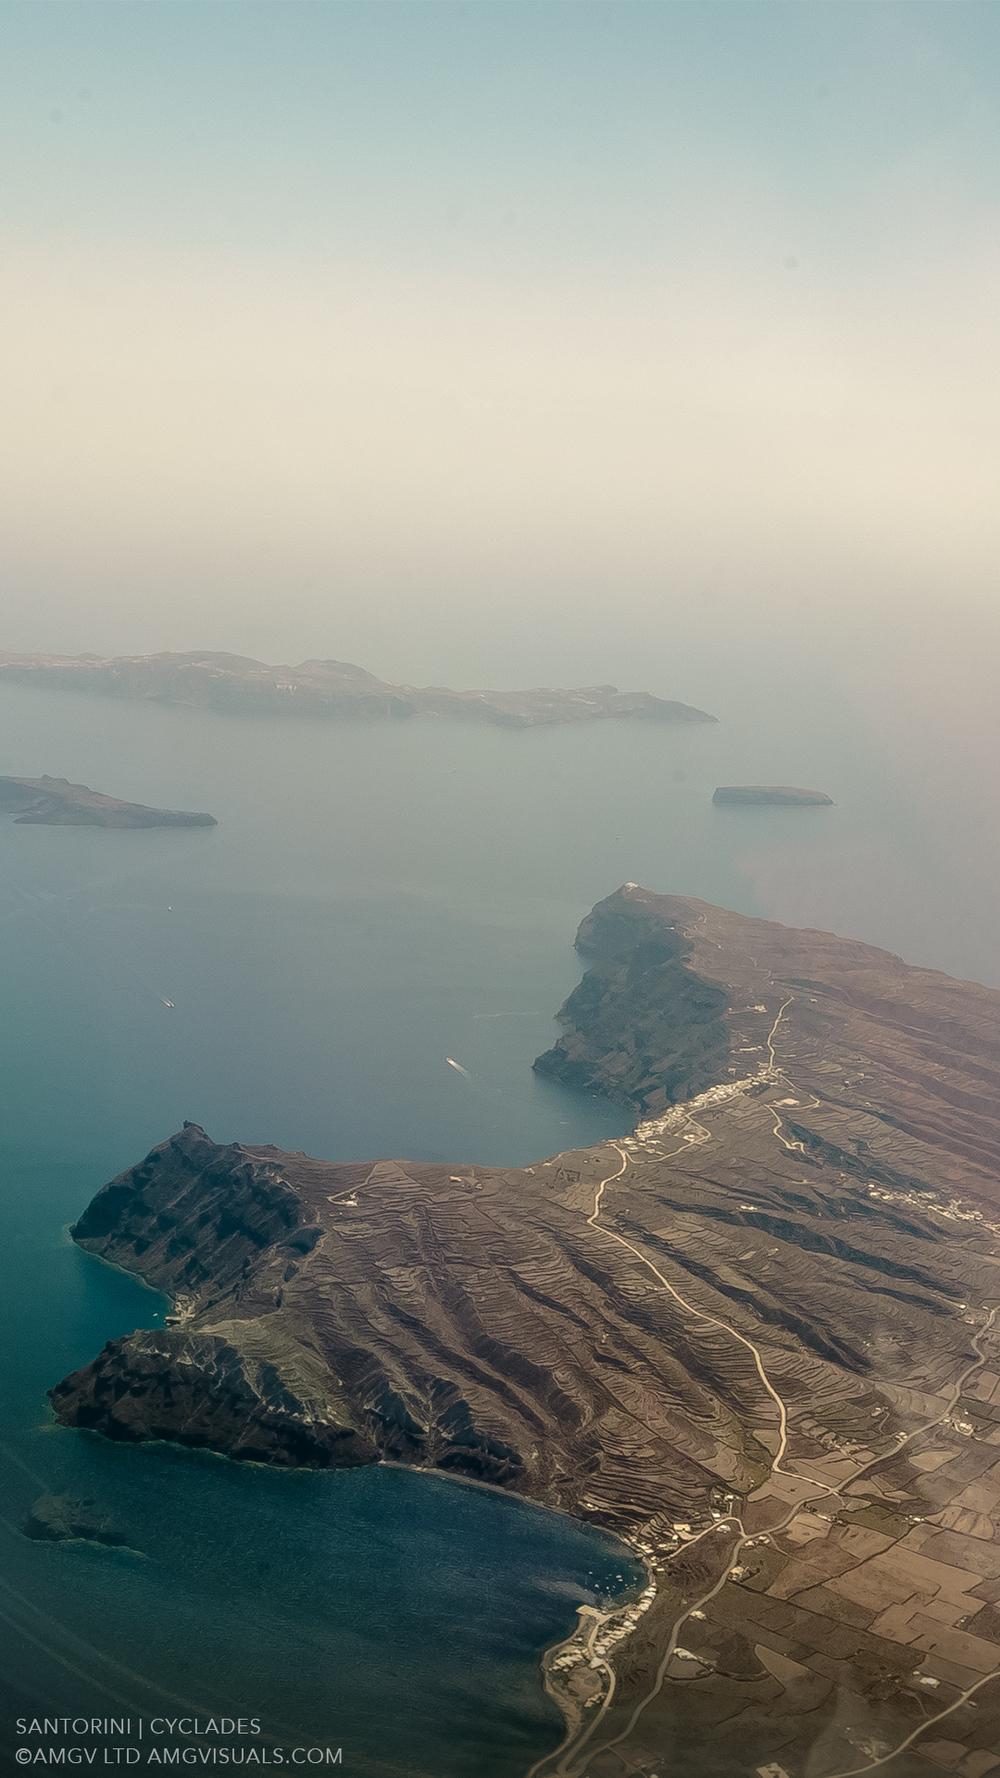 ©AMGV-LTD-Santorini+Cyclades-6.jpg